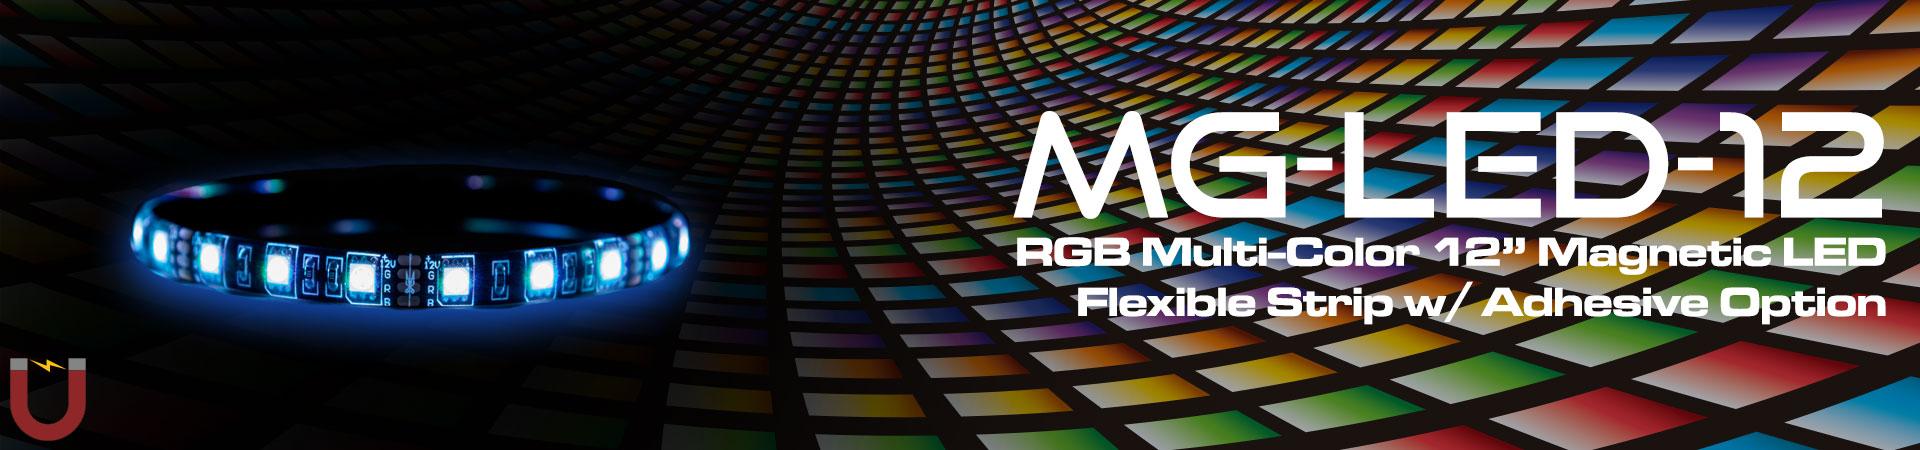 MG-LED-12_Banner2